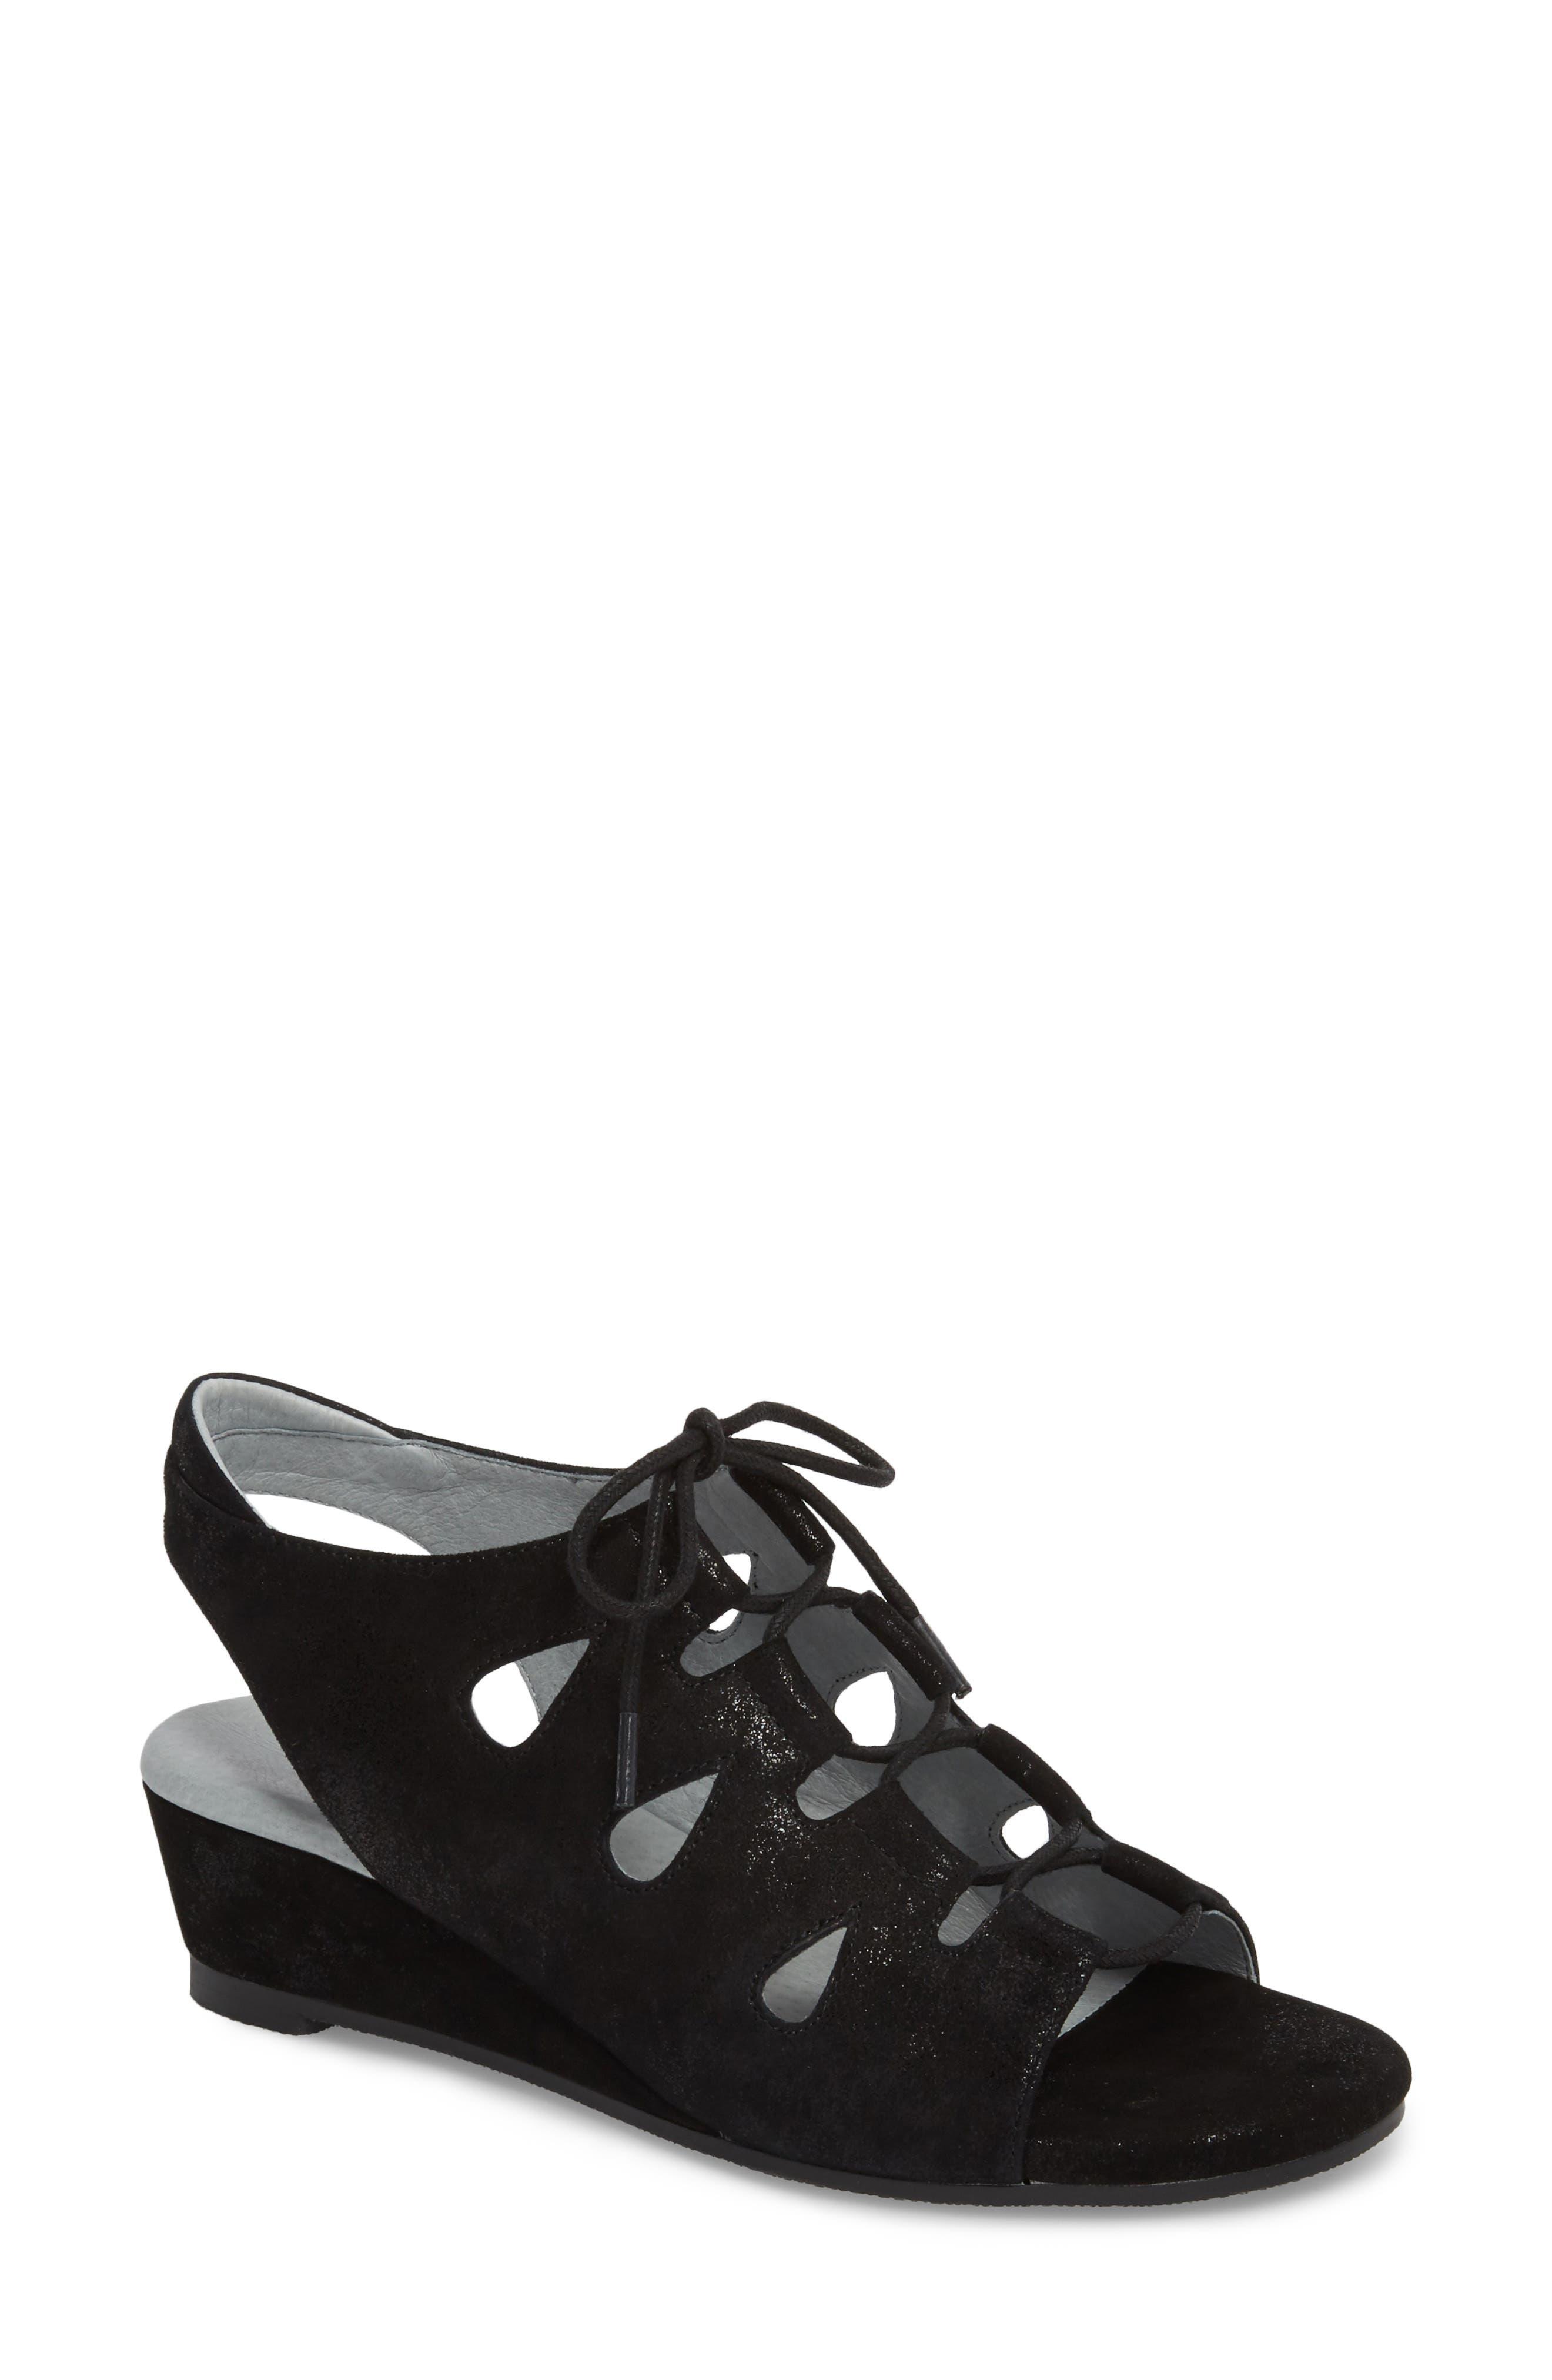 DAVID TATE, Rich Wedge Sandal, Main thumbnail 1, color, BLACK SUEDE